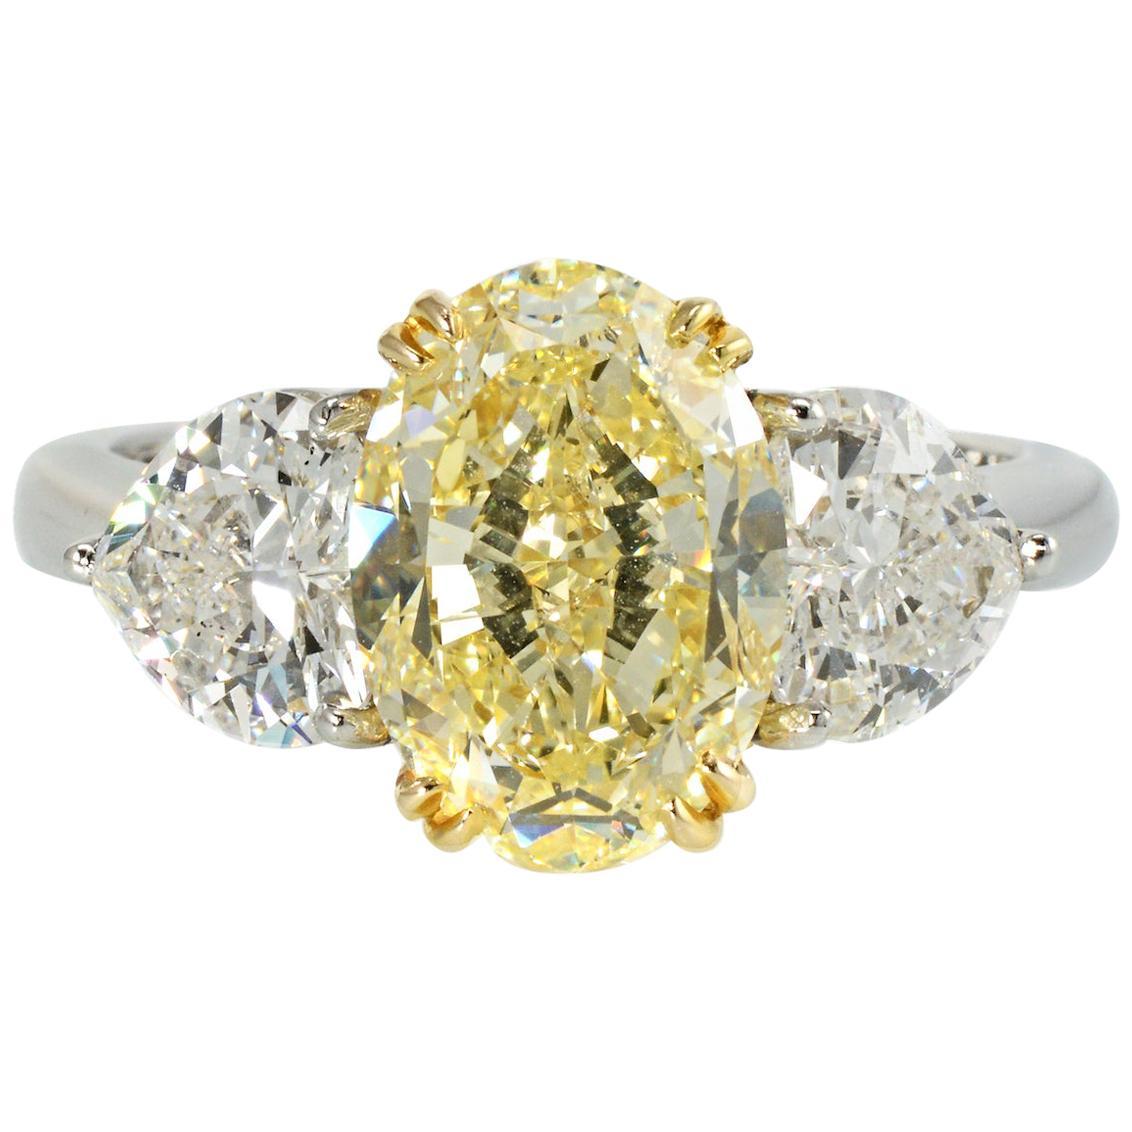 4.09 Carat Oval Cut Fancy Yellow Three-Stone Diamond Engagement Ring